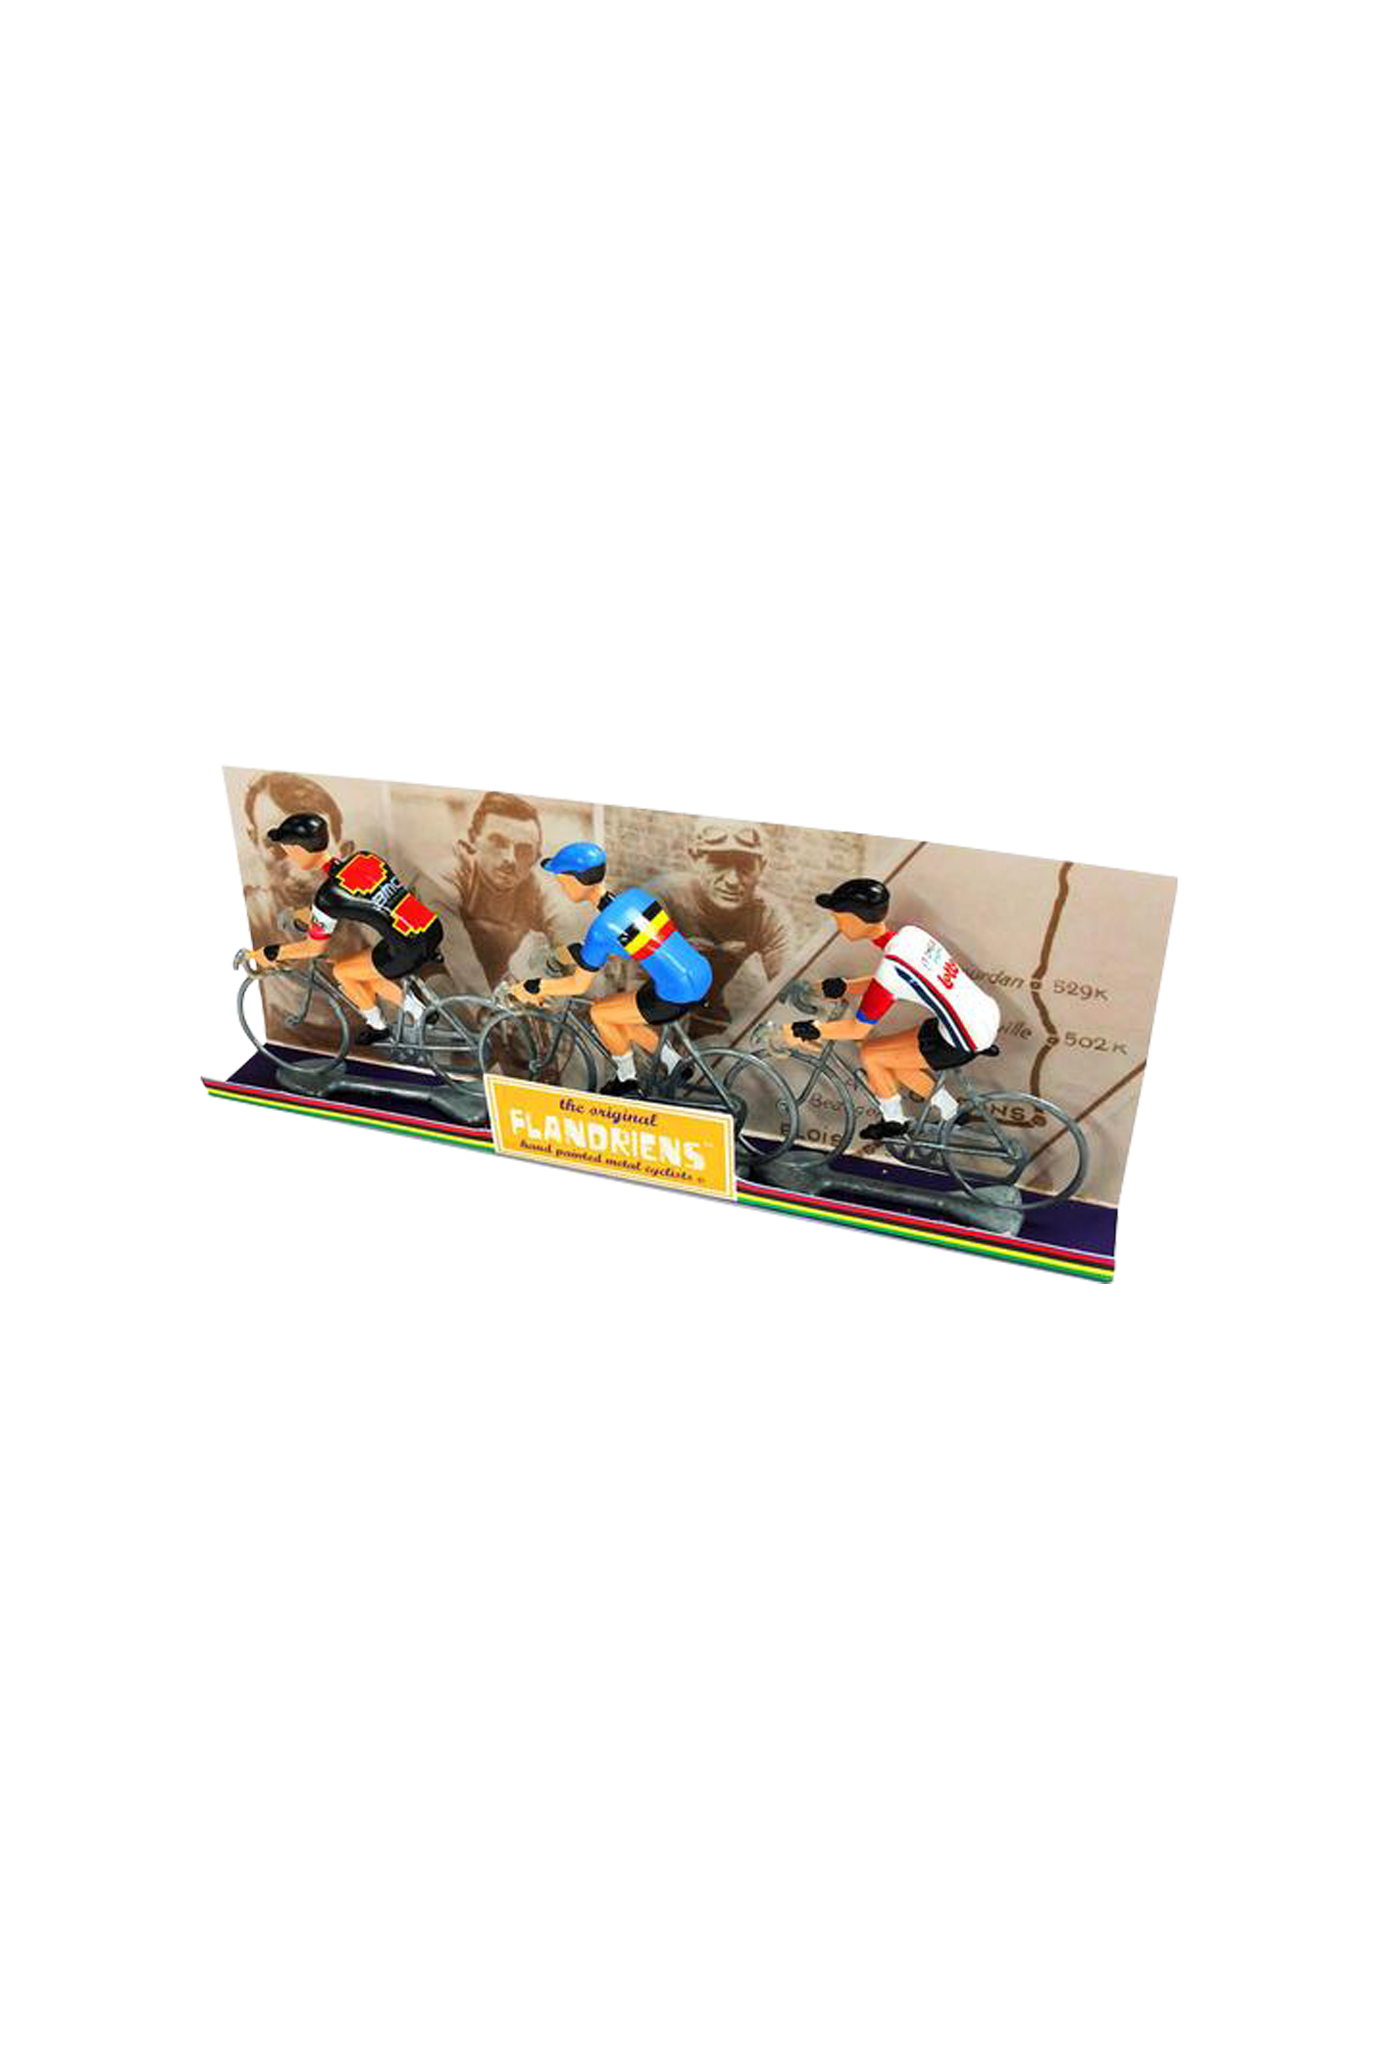 Miniatuur wielrenners - Cycling hero's 3 st (diverse varianten)-2